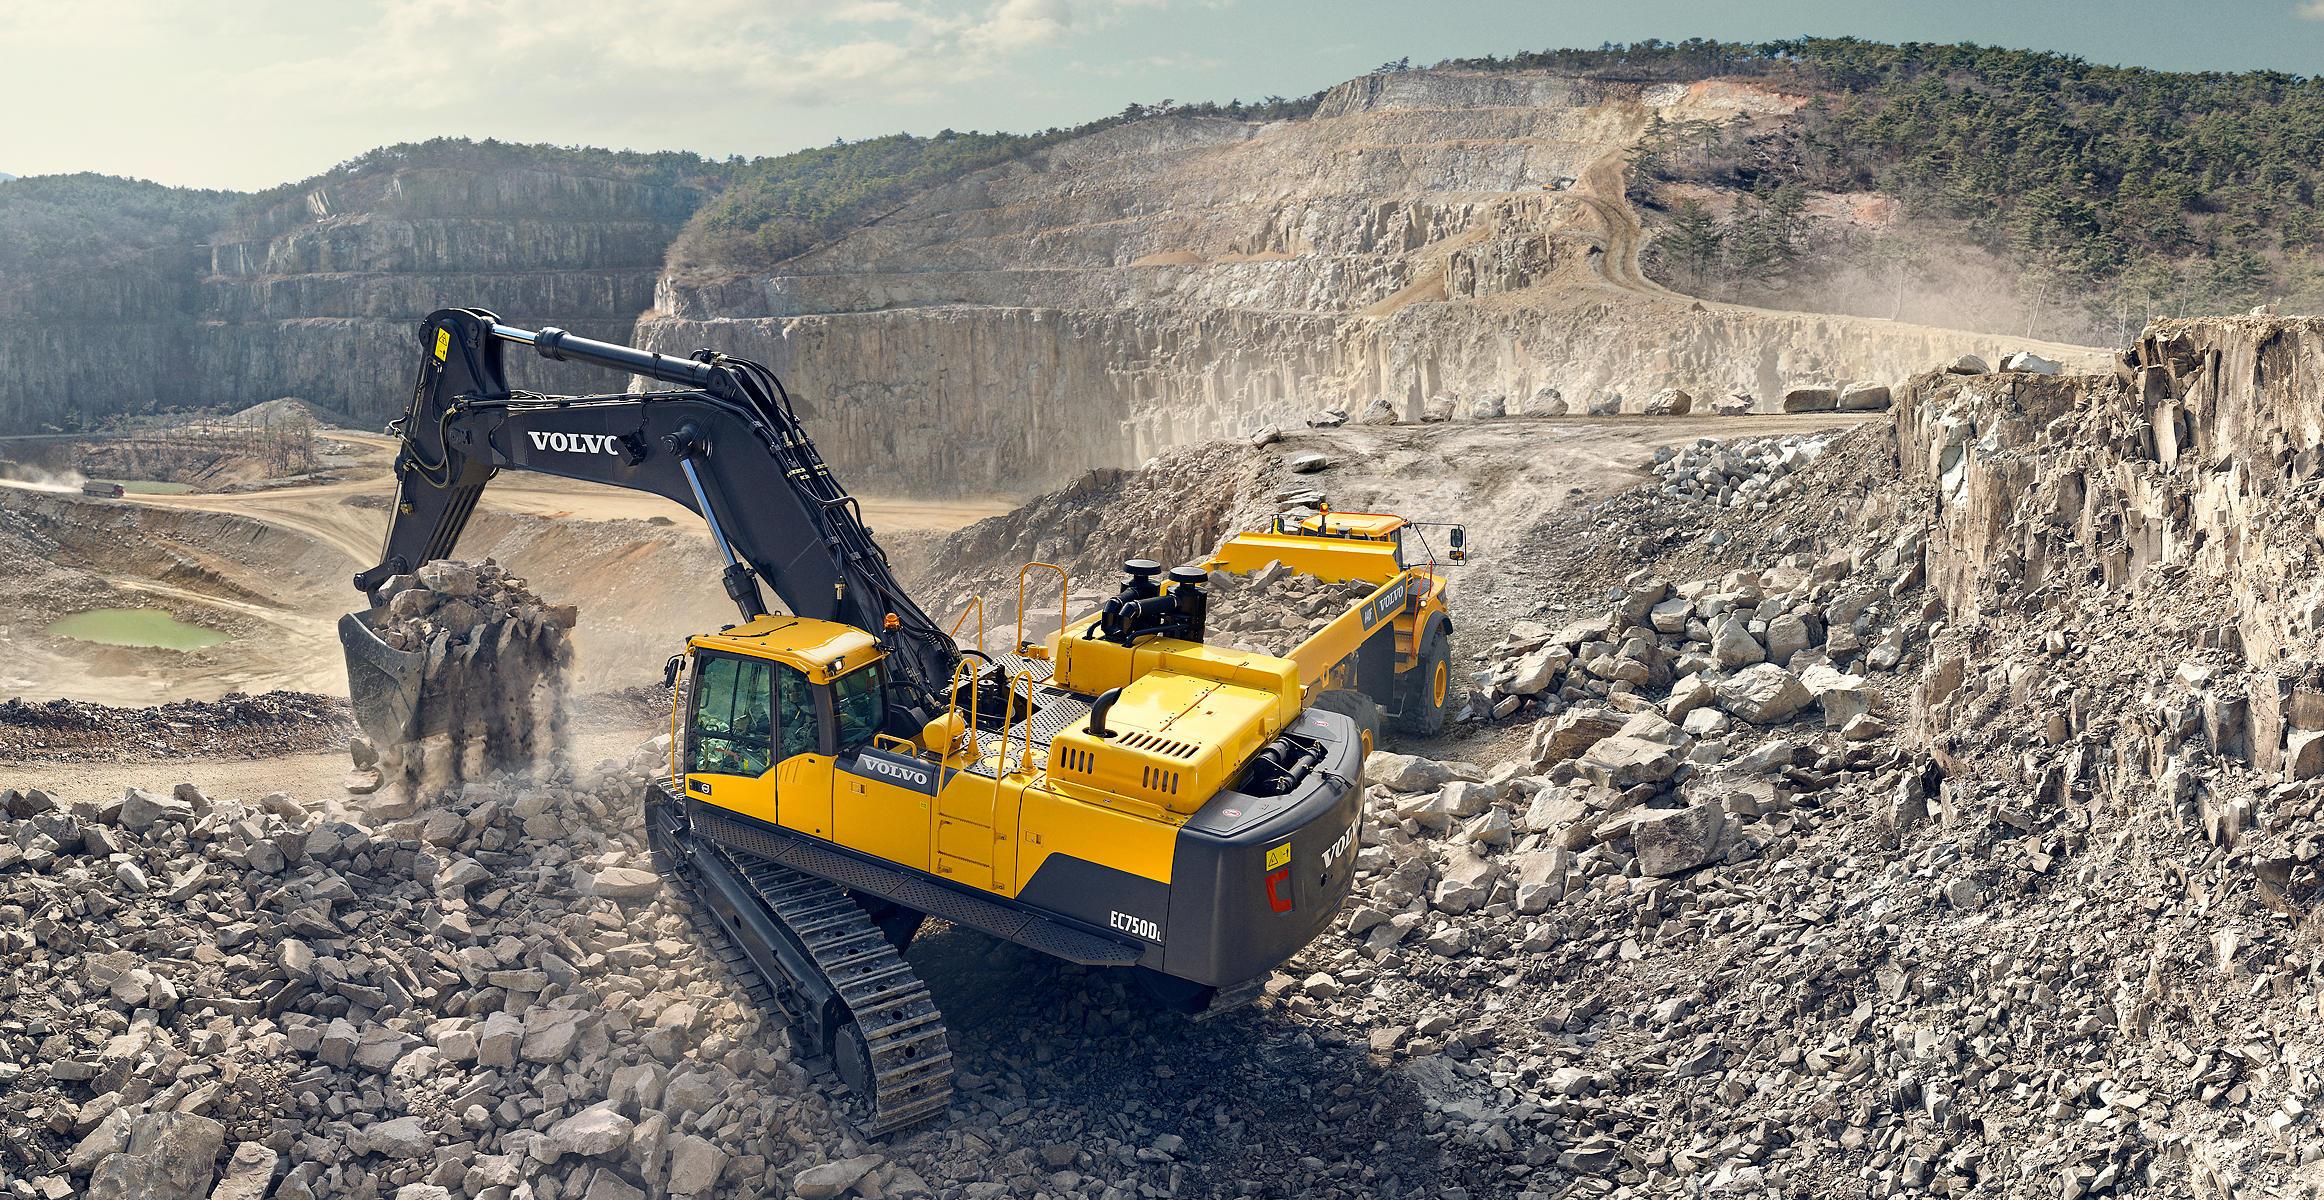 Ec750d Crawler Excavators Features Volvo